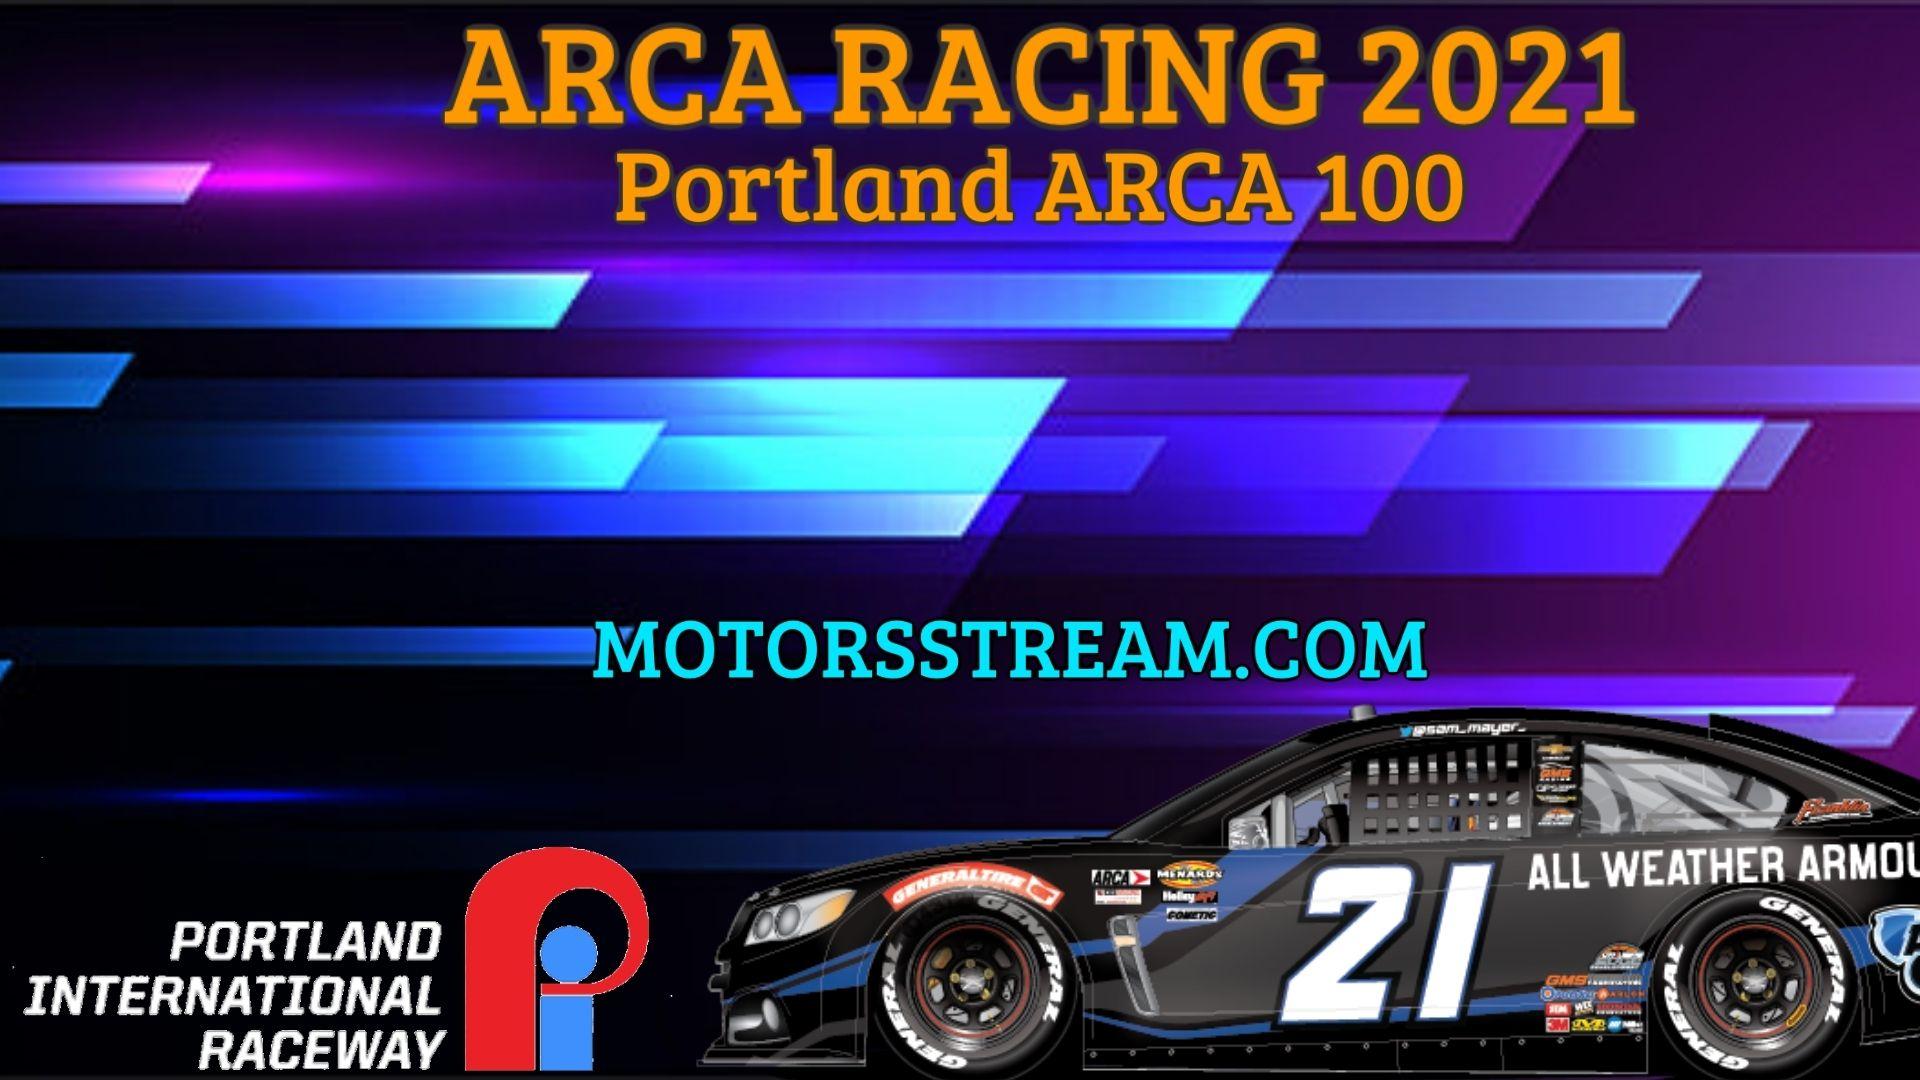 Portland ARCA 100 Live Stream 2021 Arca Racing